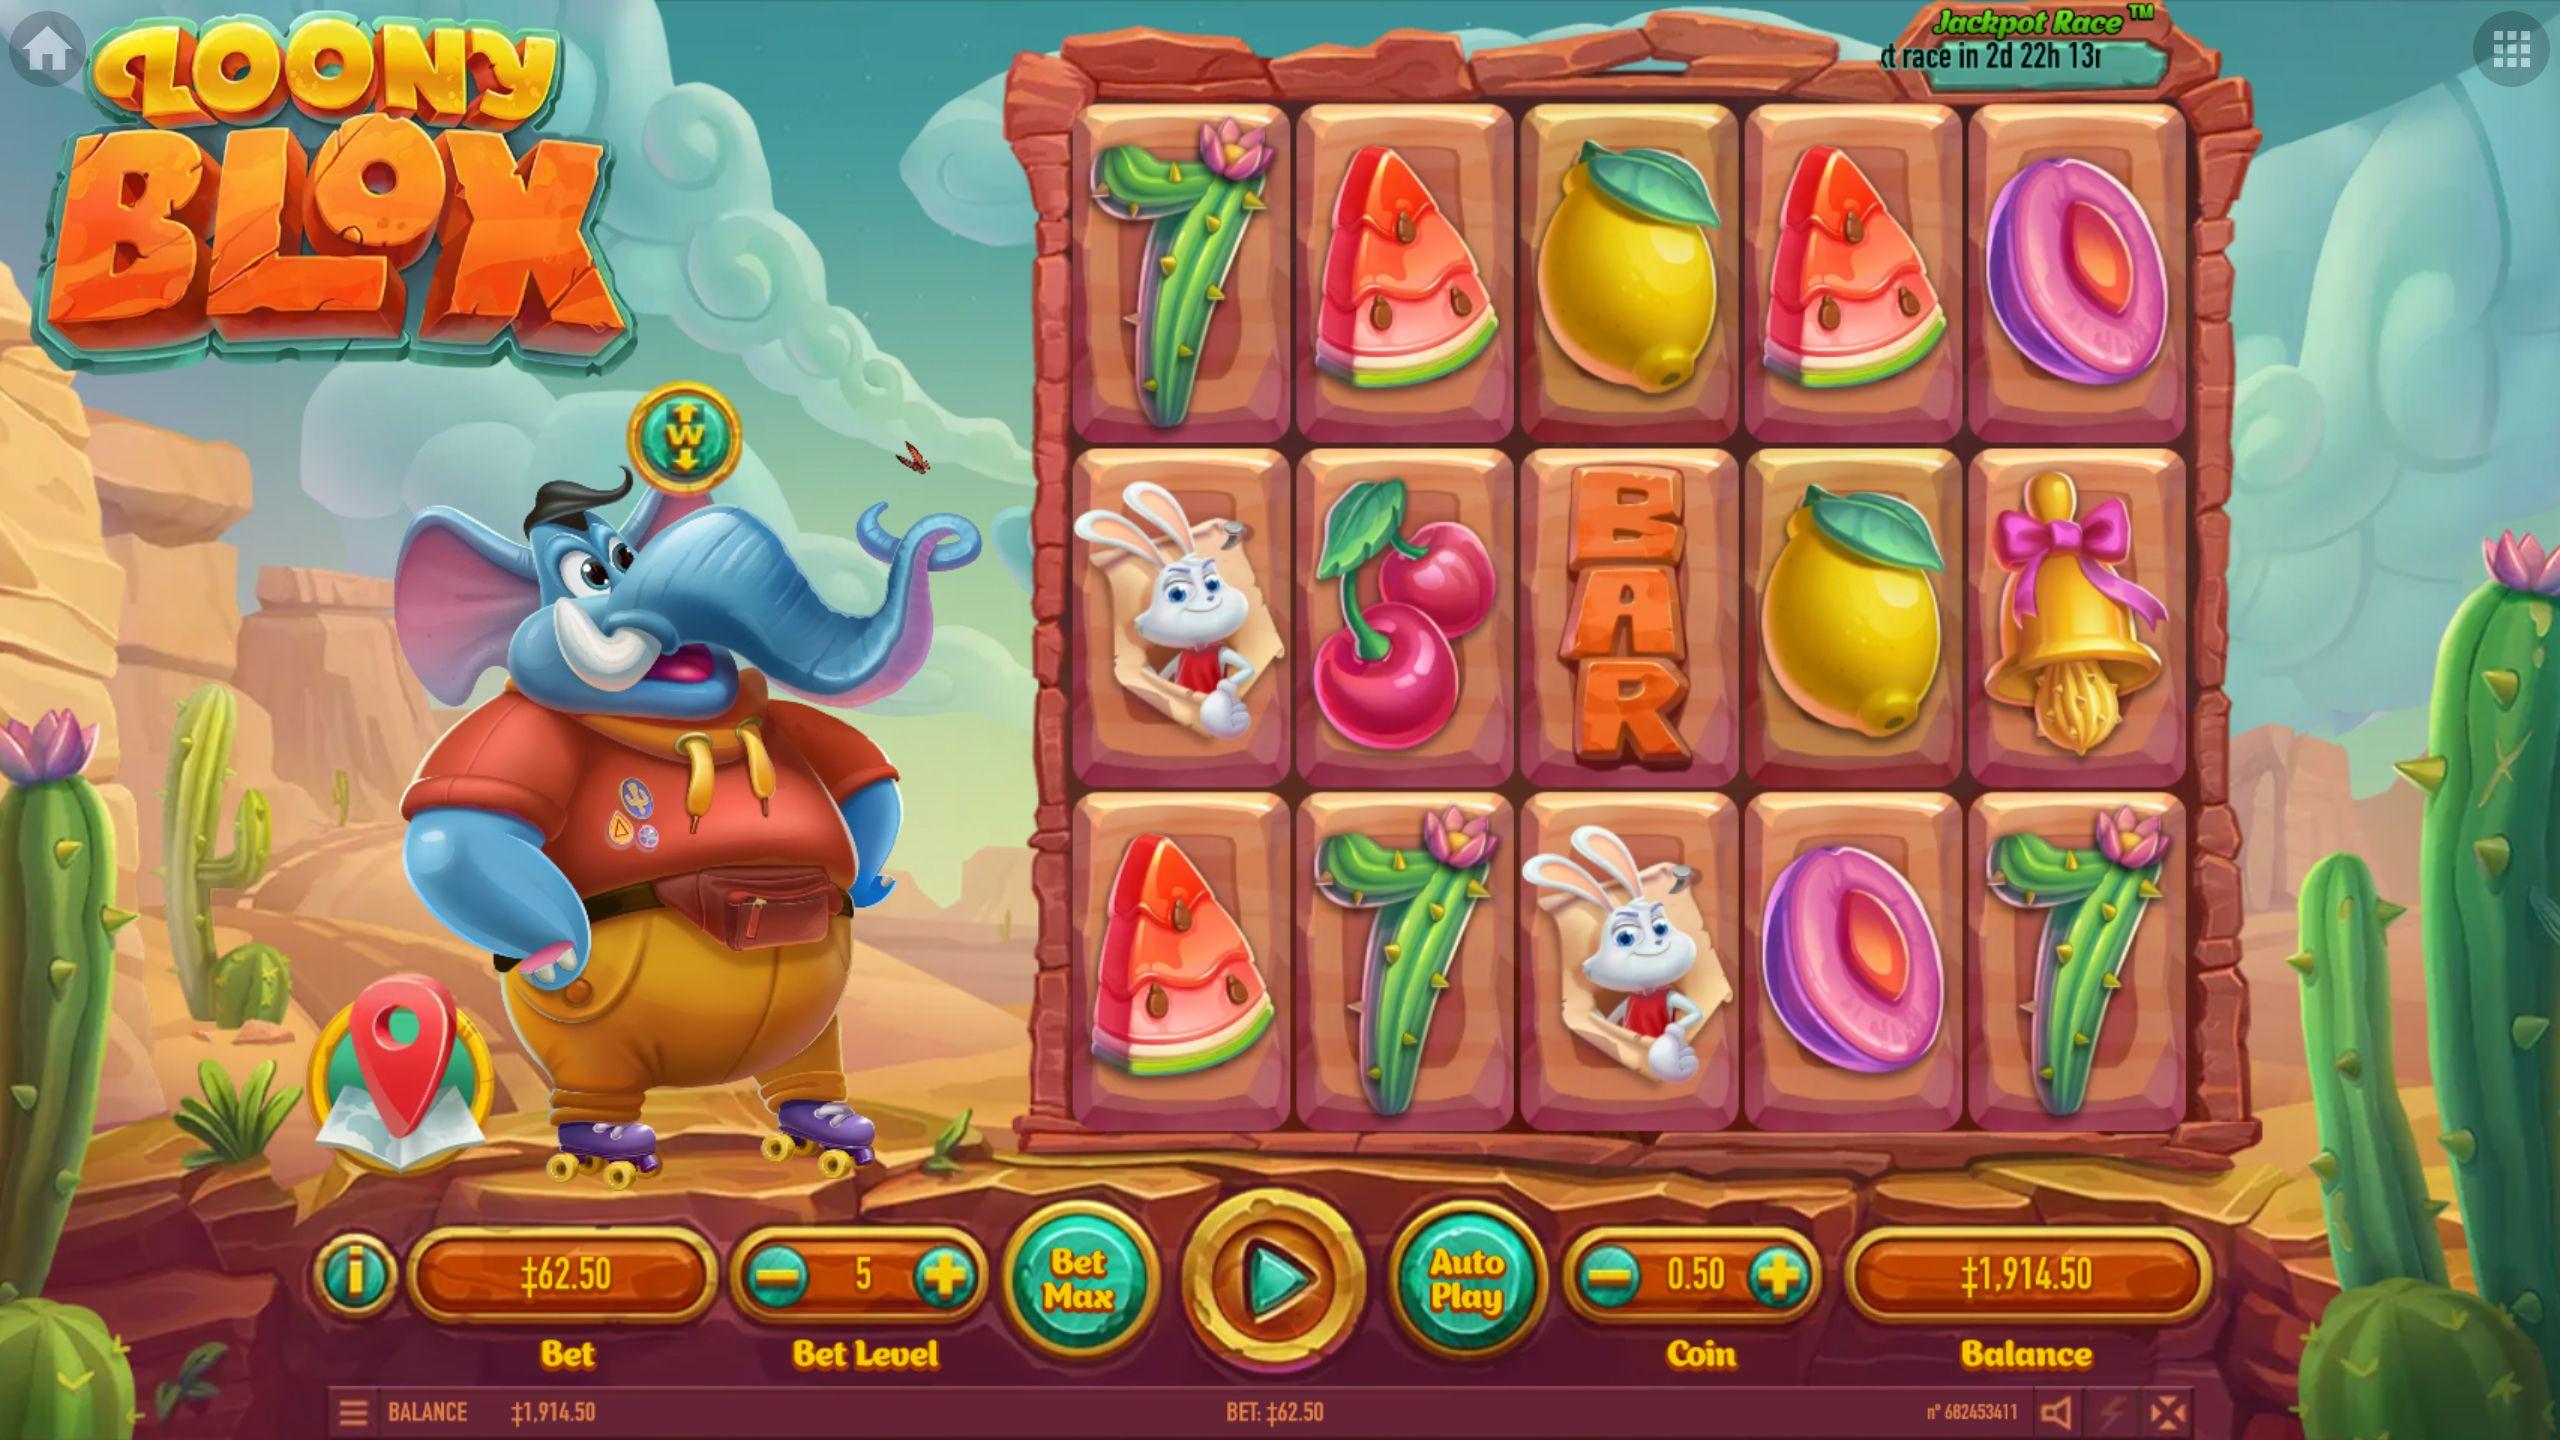 Loony Blox Slot Machine